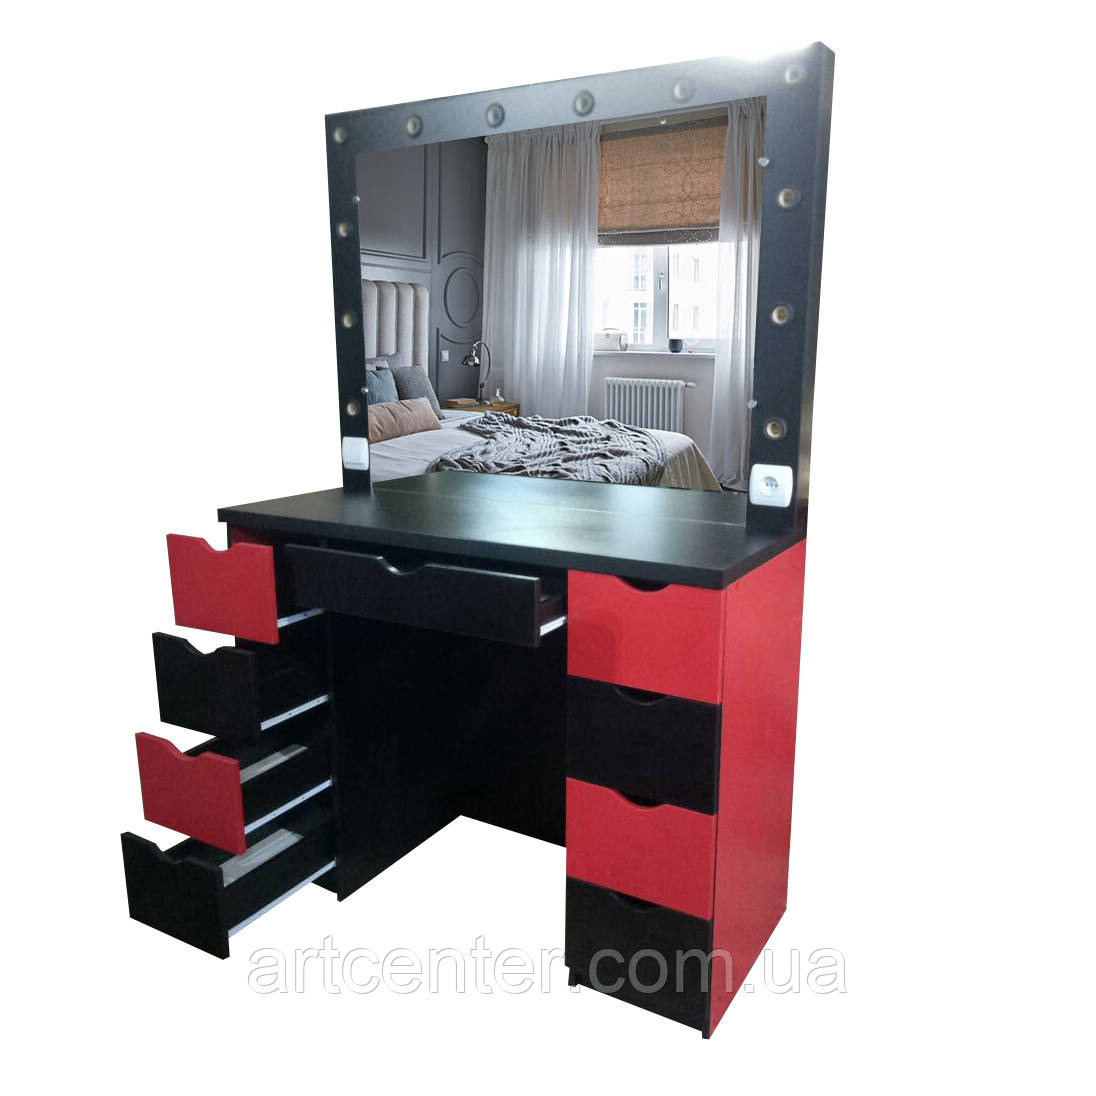 Стол с зеркалом, стол для парикмахера, стол для визажиста